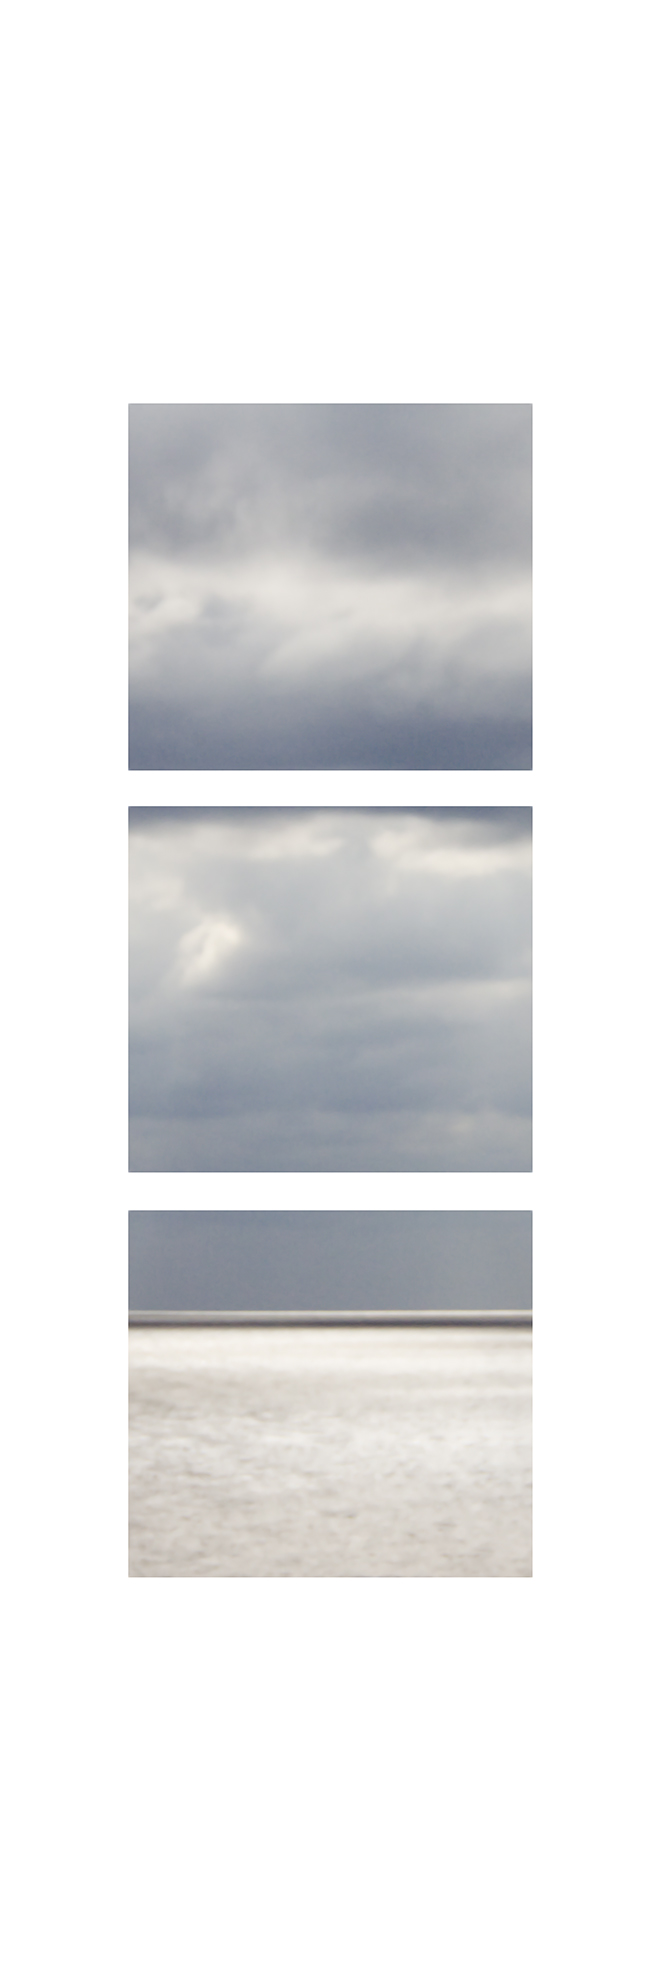 On the Sea, No.6